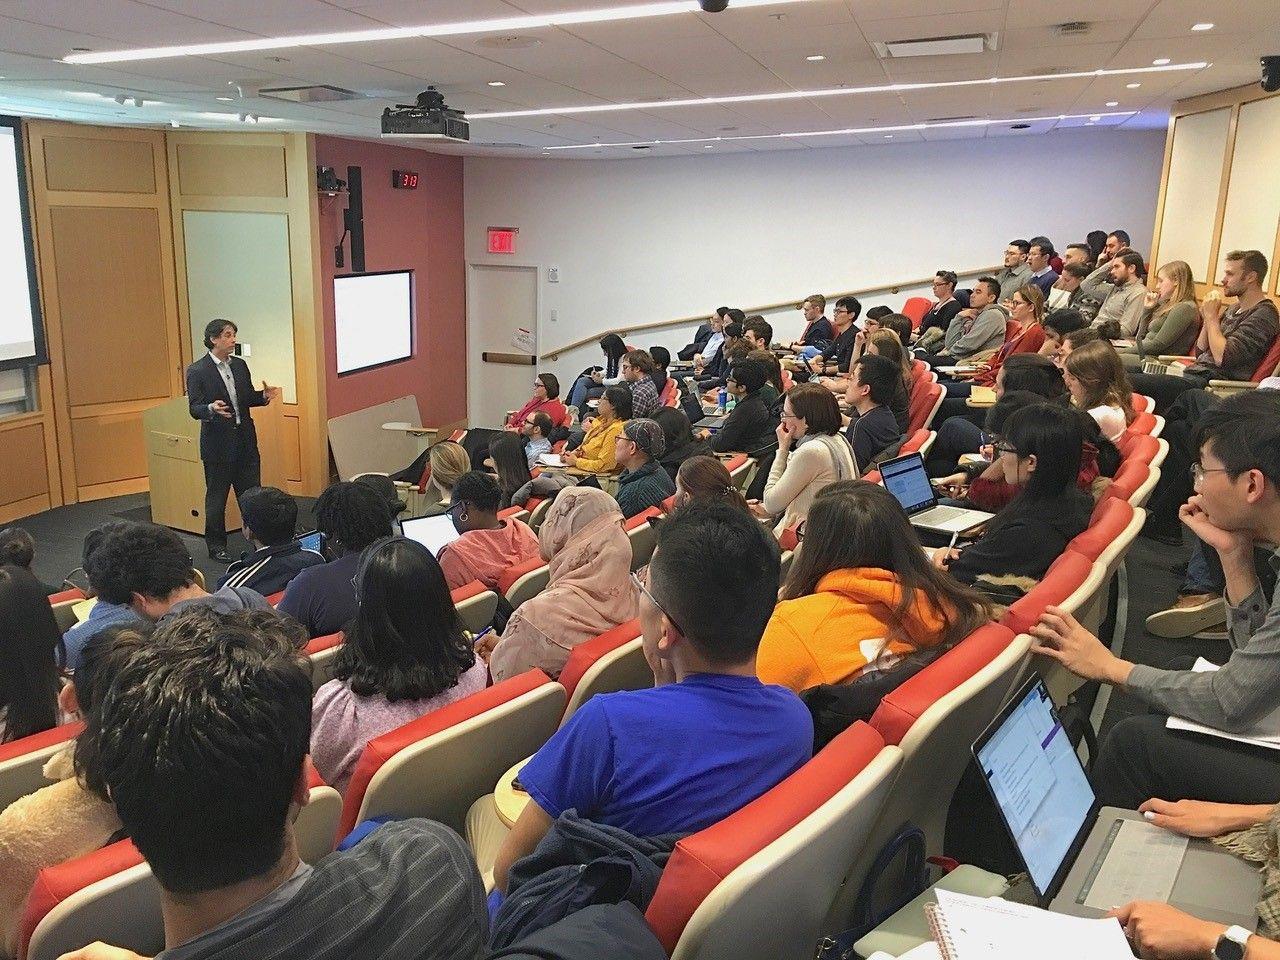 graduate school course, Pharmacology, New York City